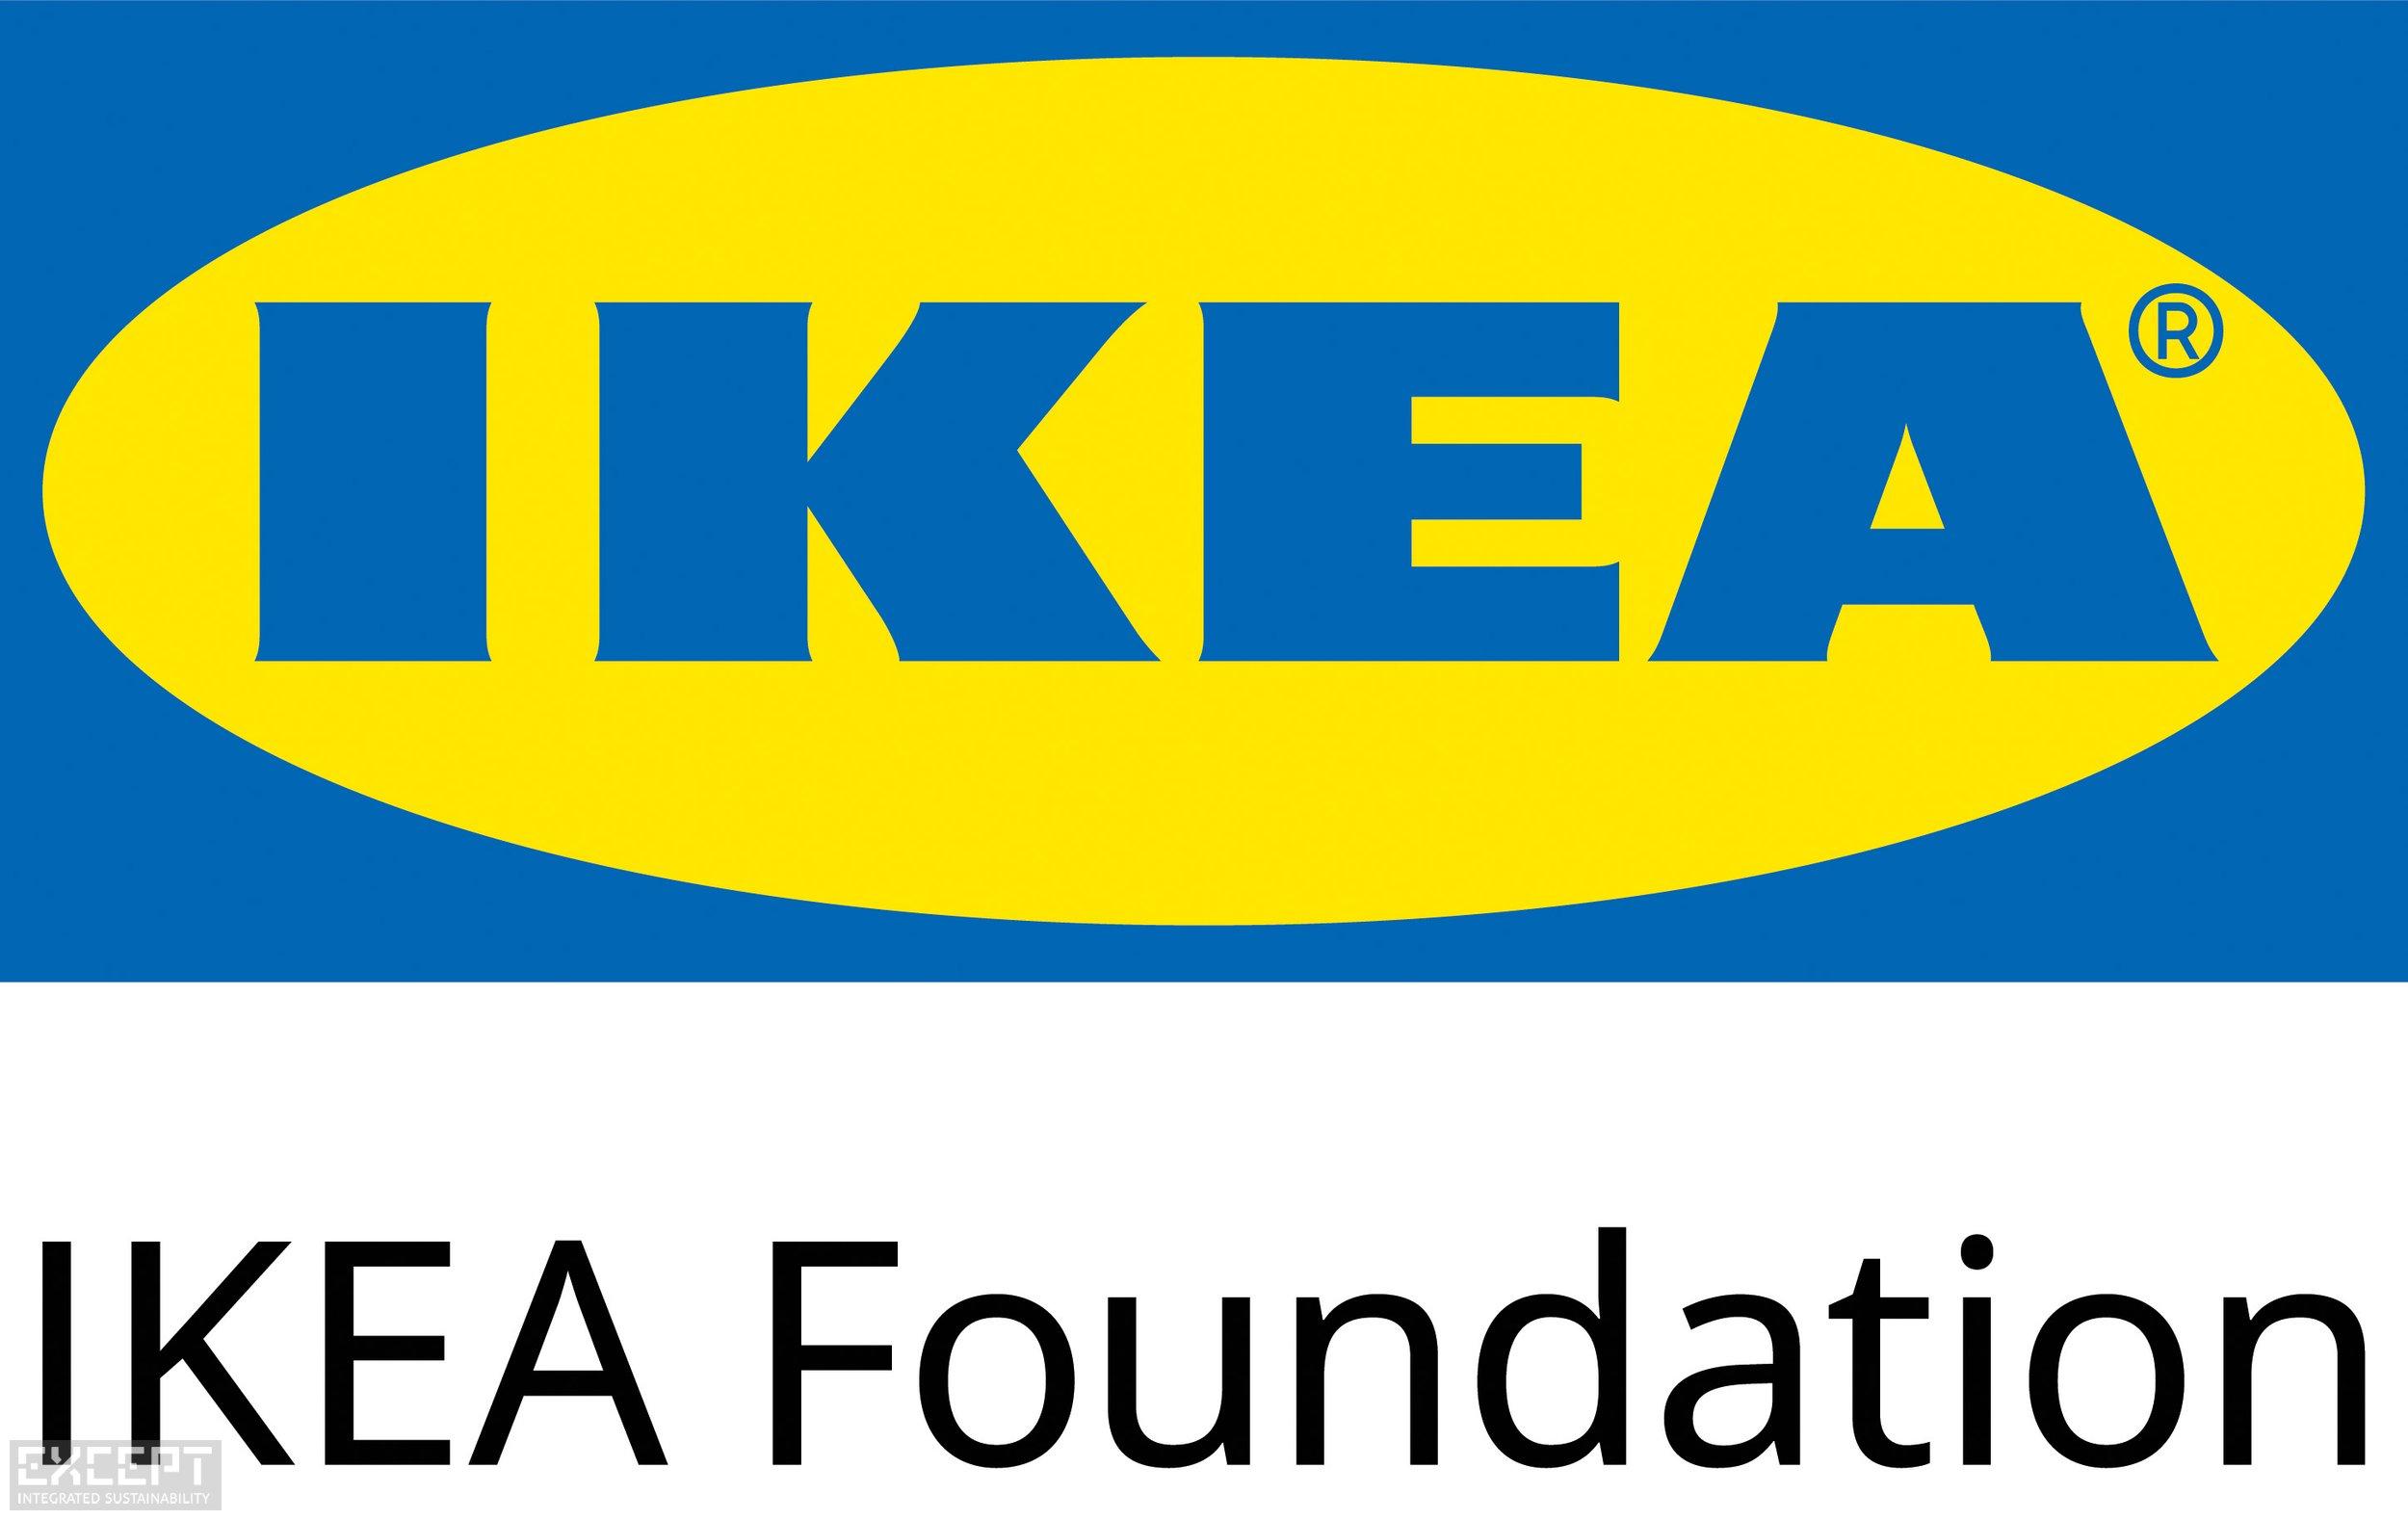 Ikea Foundation, Rockefeller Foundation to Set Up USD 1 Bn Global Platform to Fight Climate Change